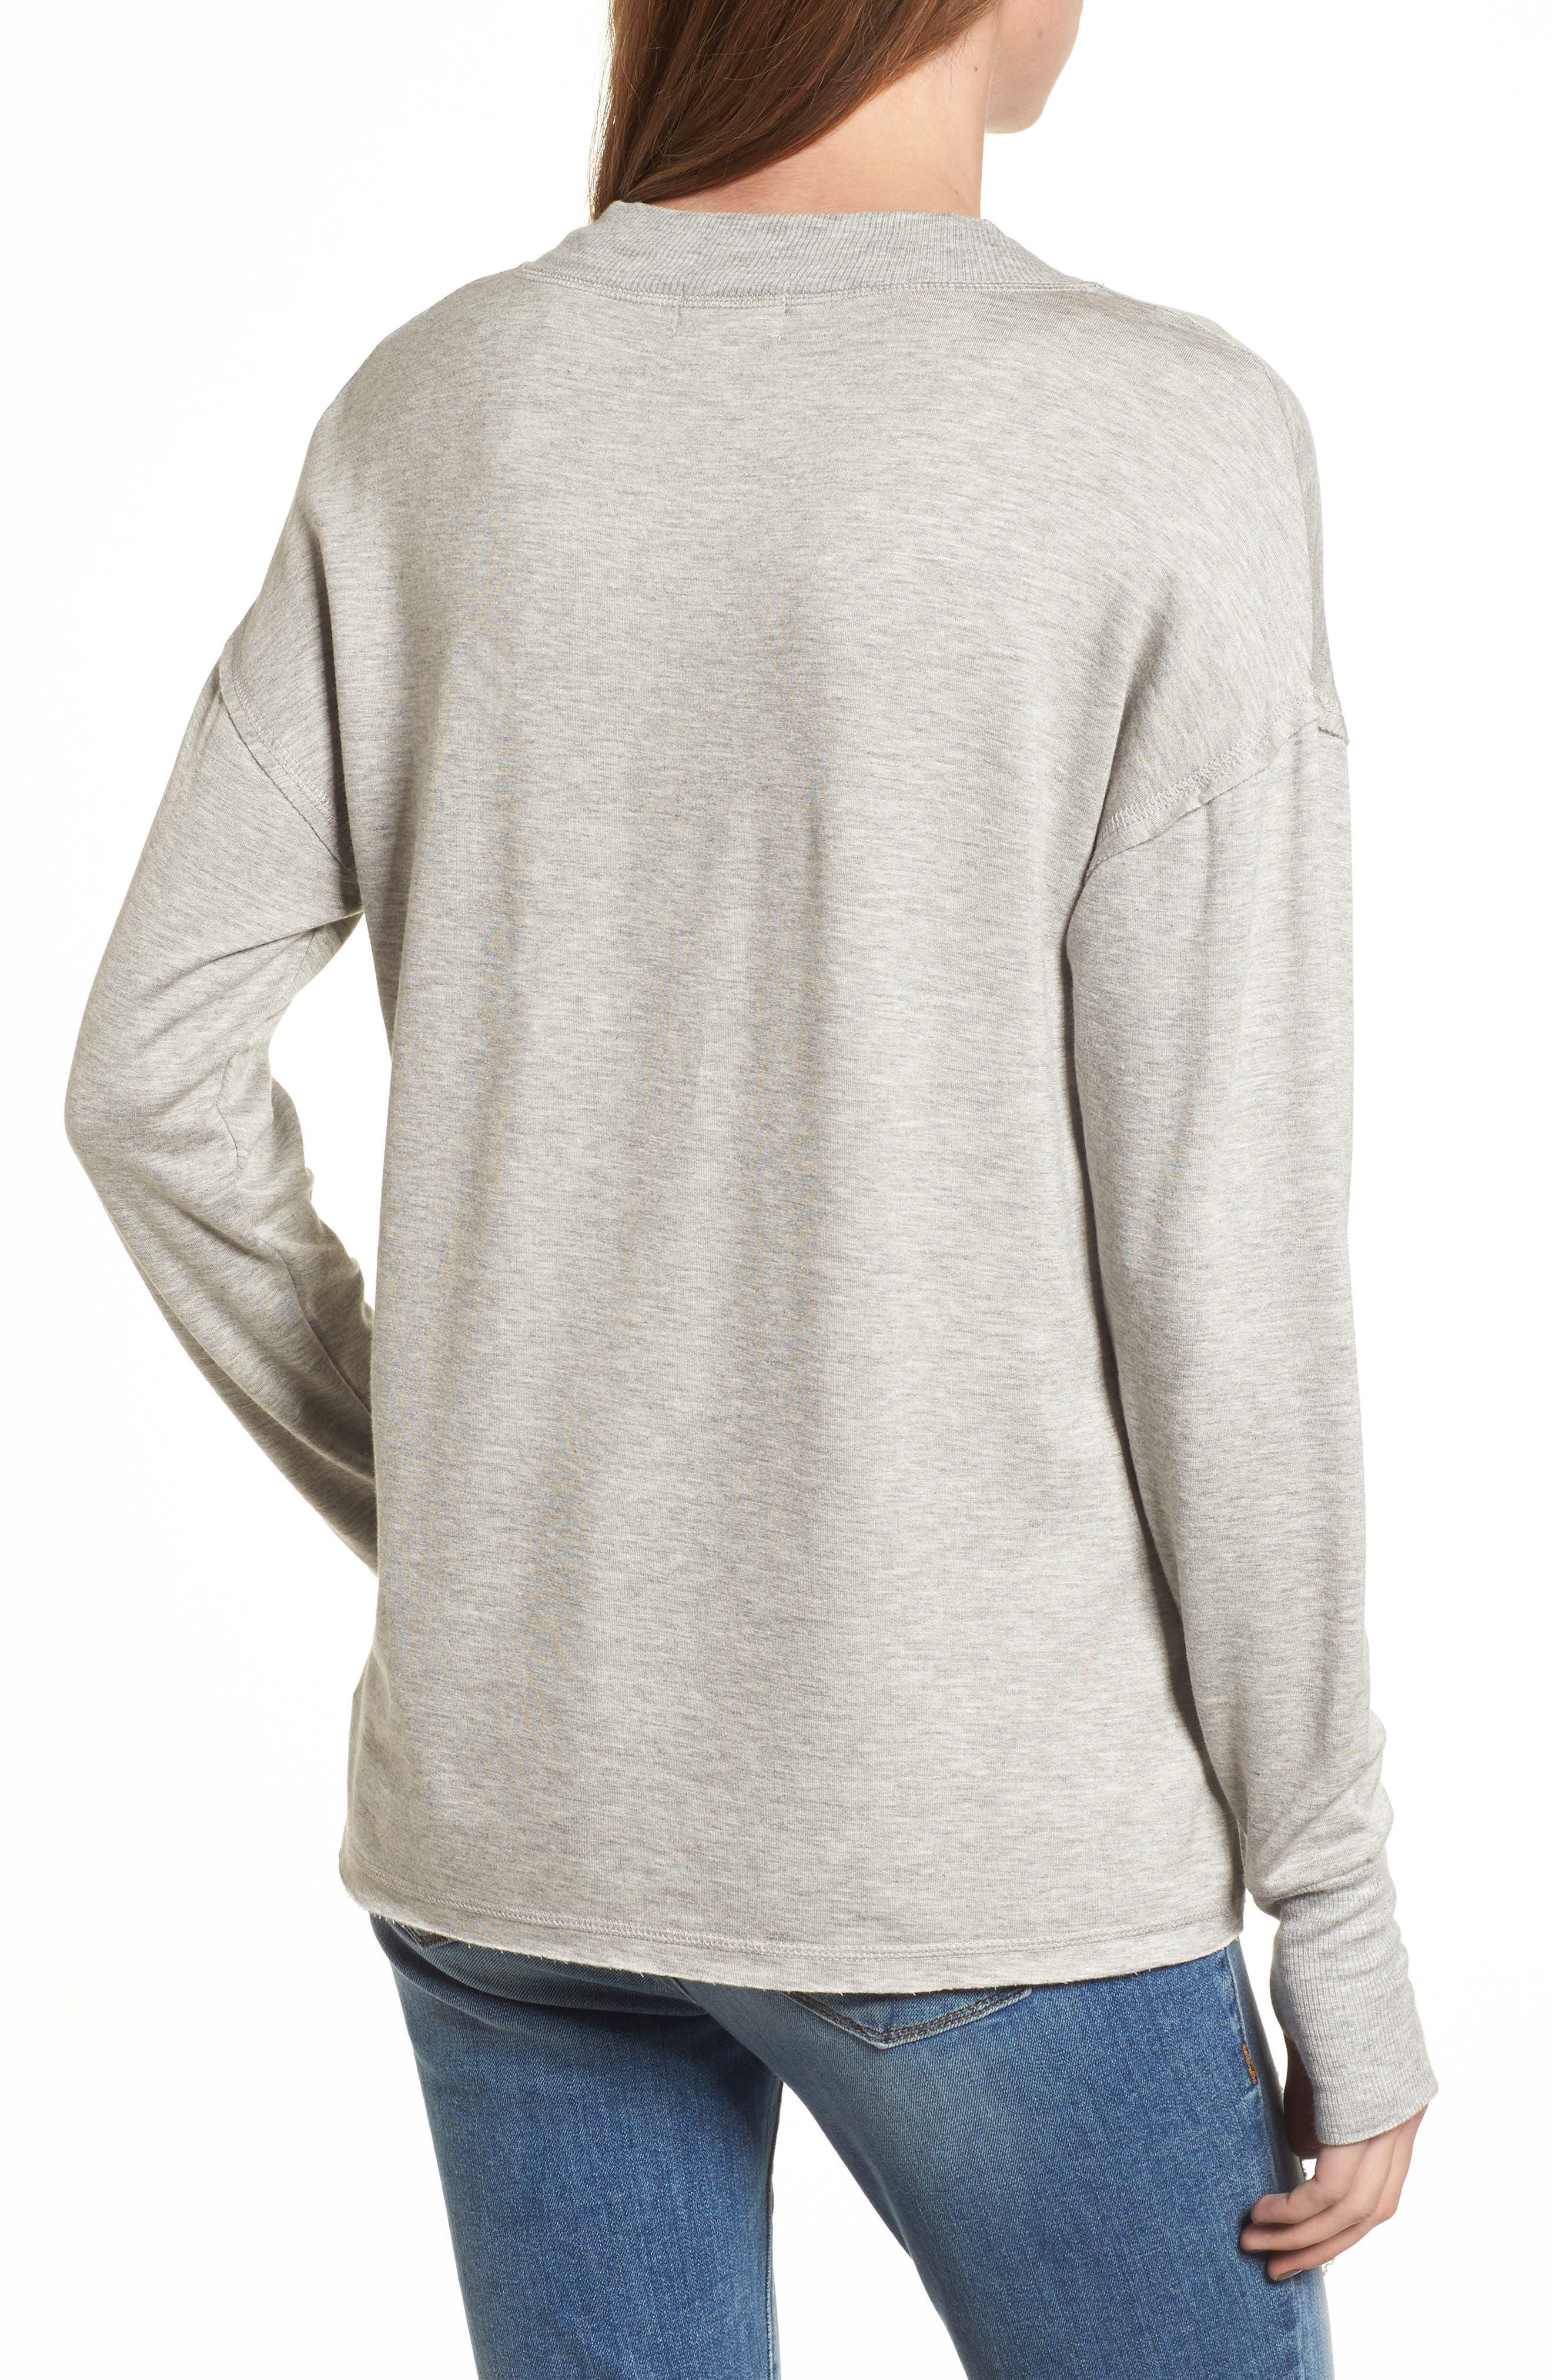 Thumbhole Cuff Sweater,                             Alternate thumbnail 2, color,                             020